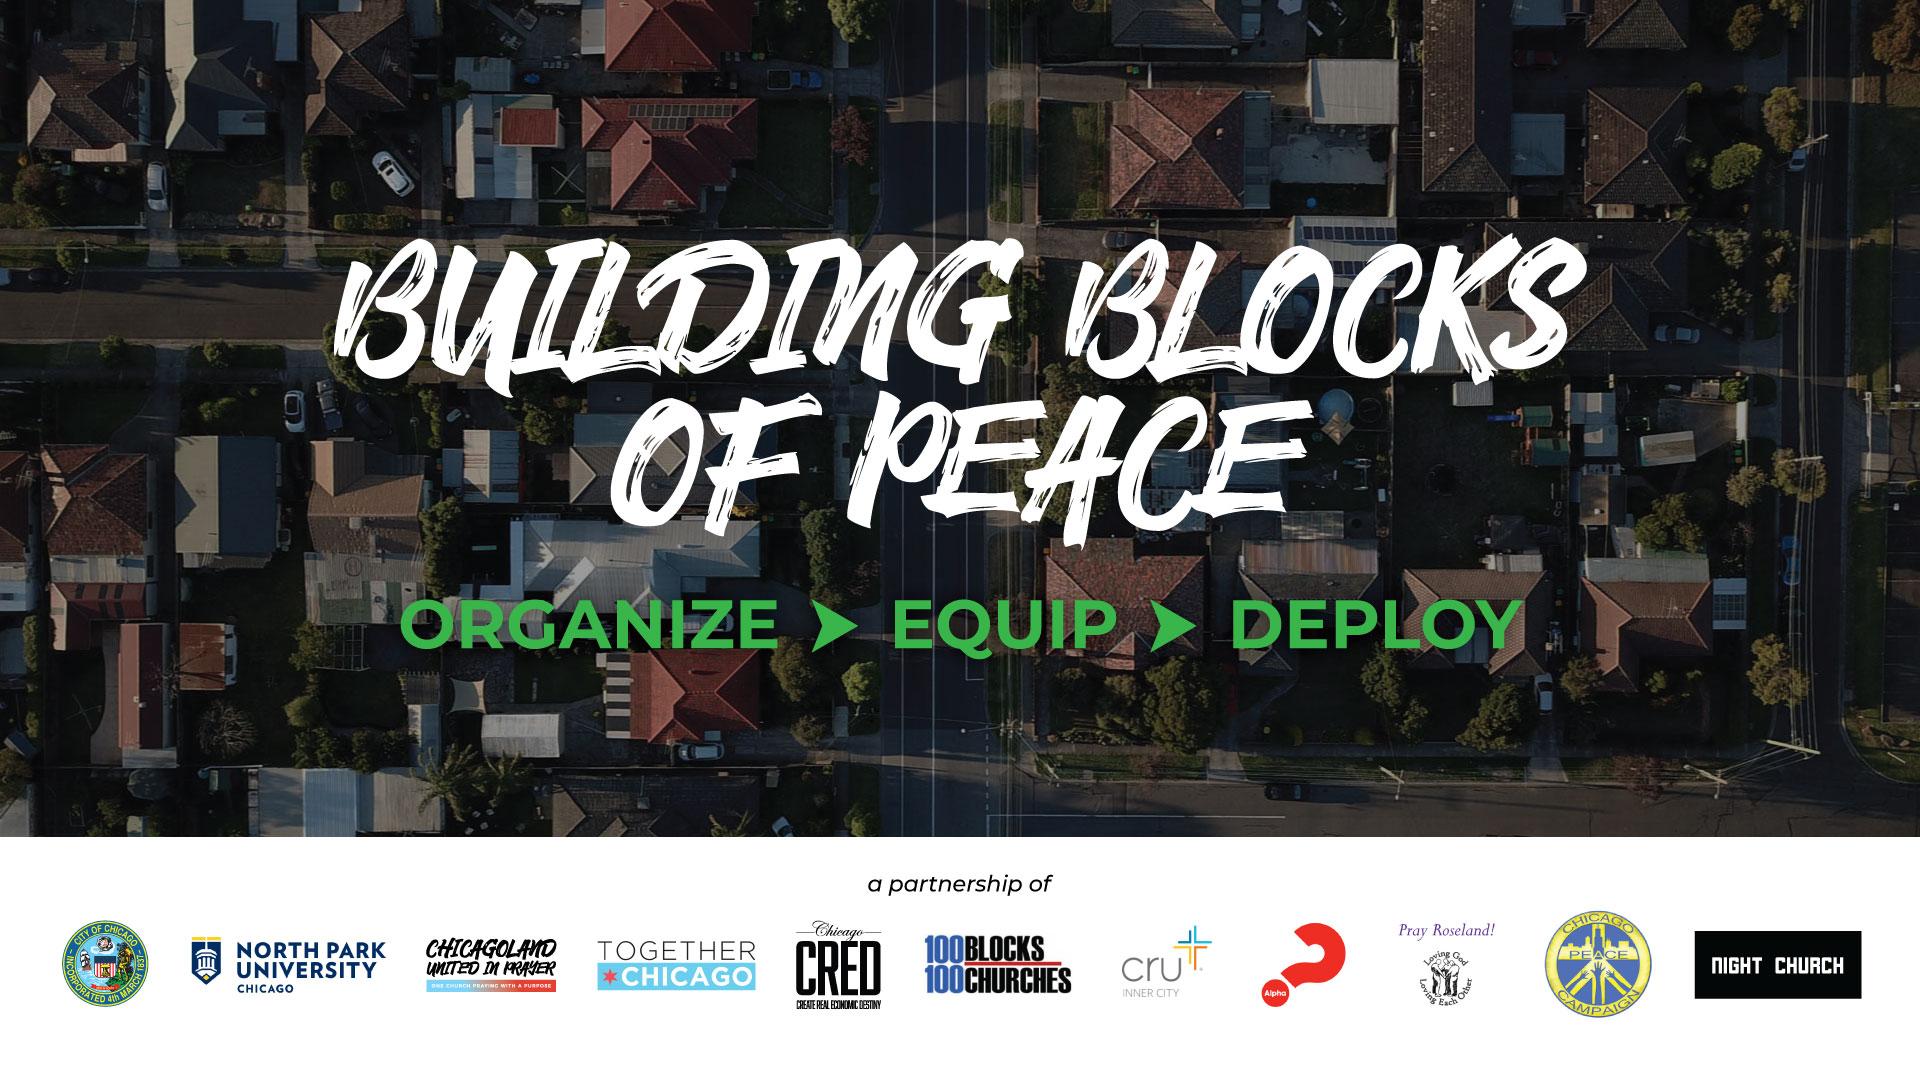 Building Blocks of Peace